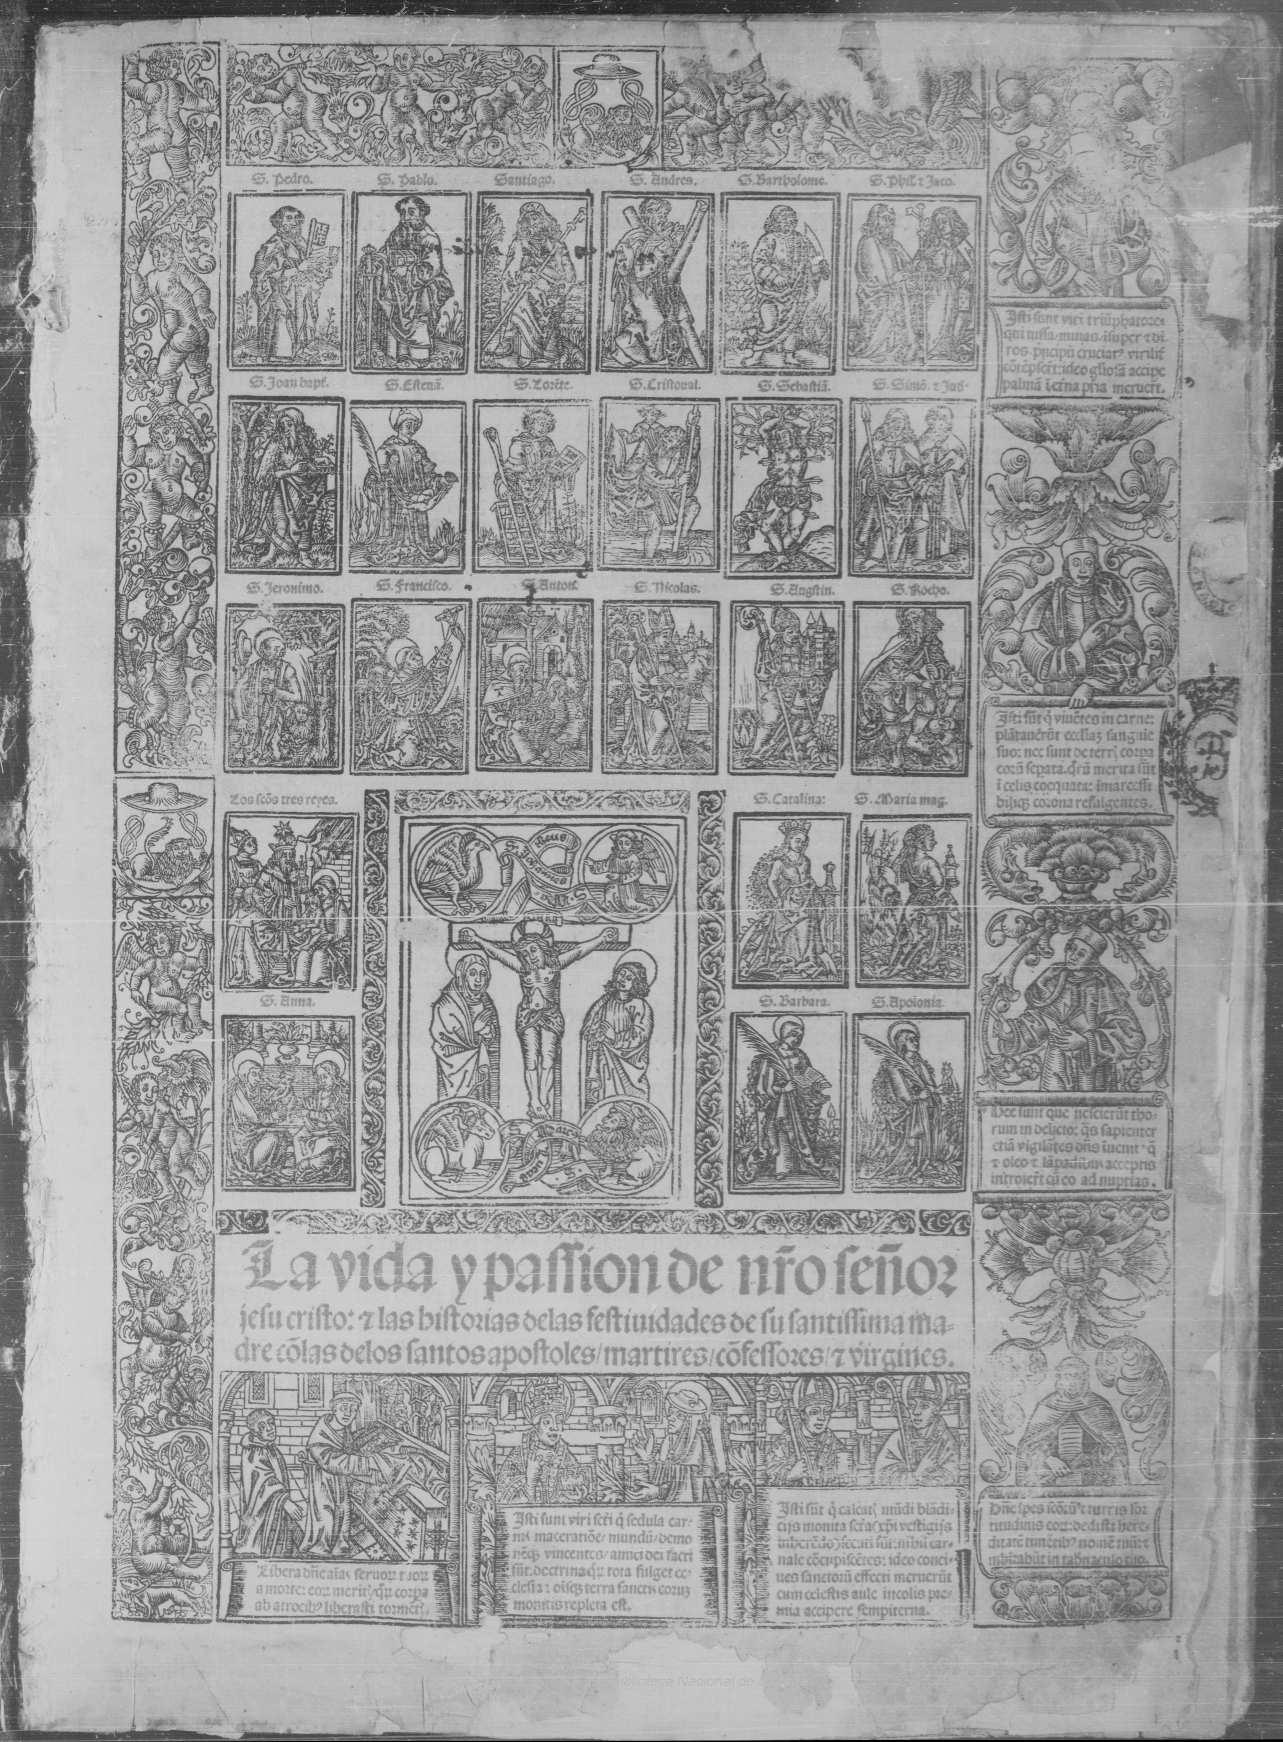 flos-sanctorum-1516